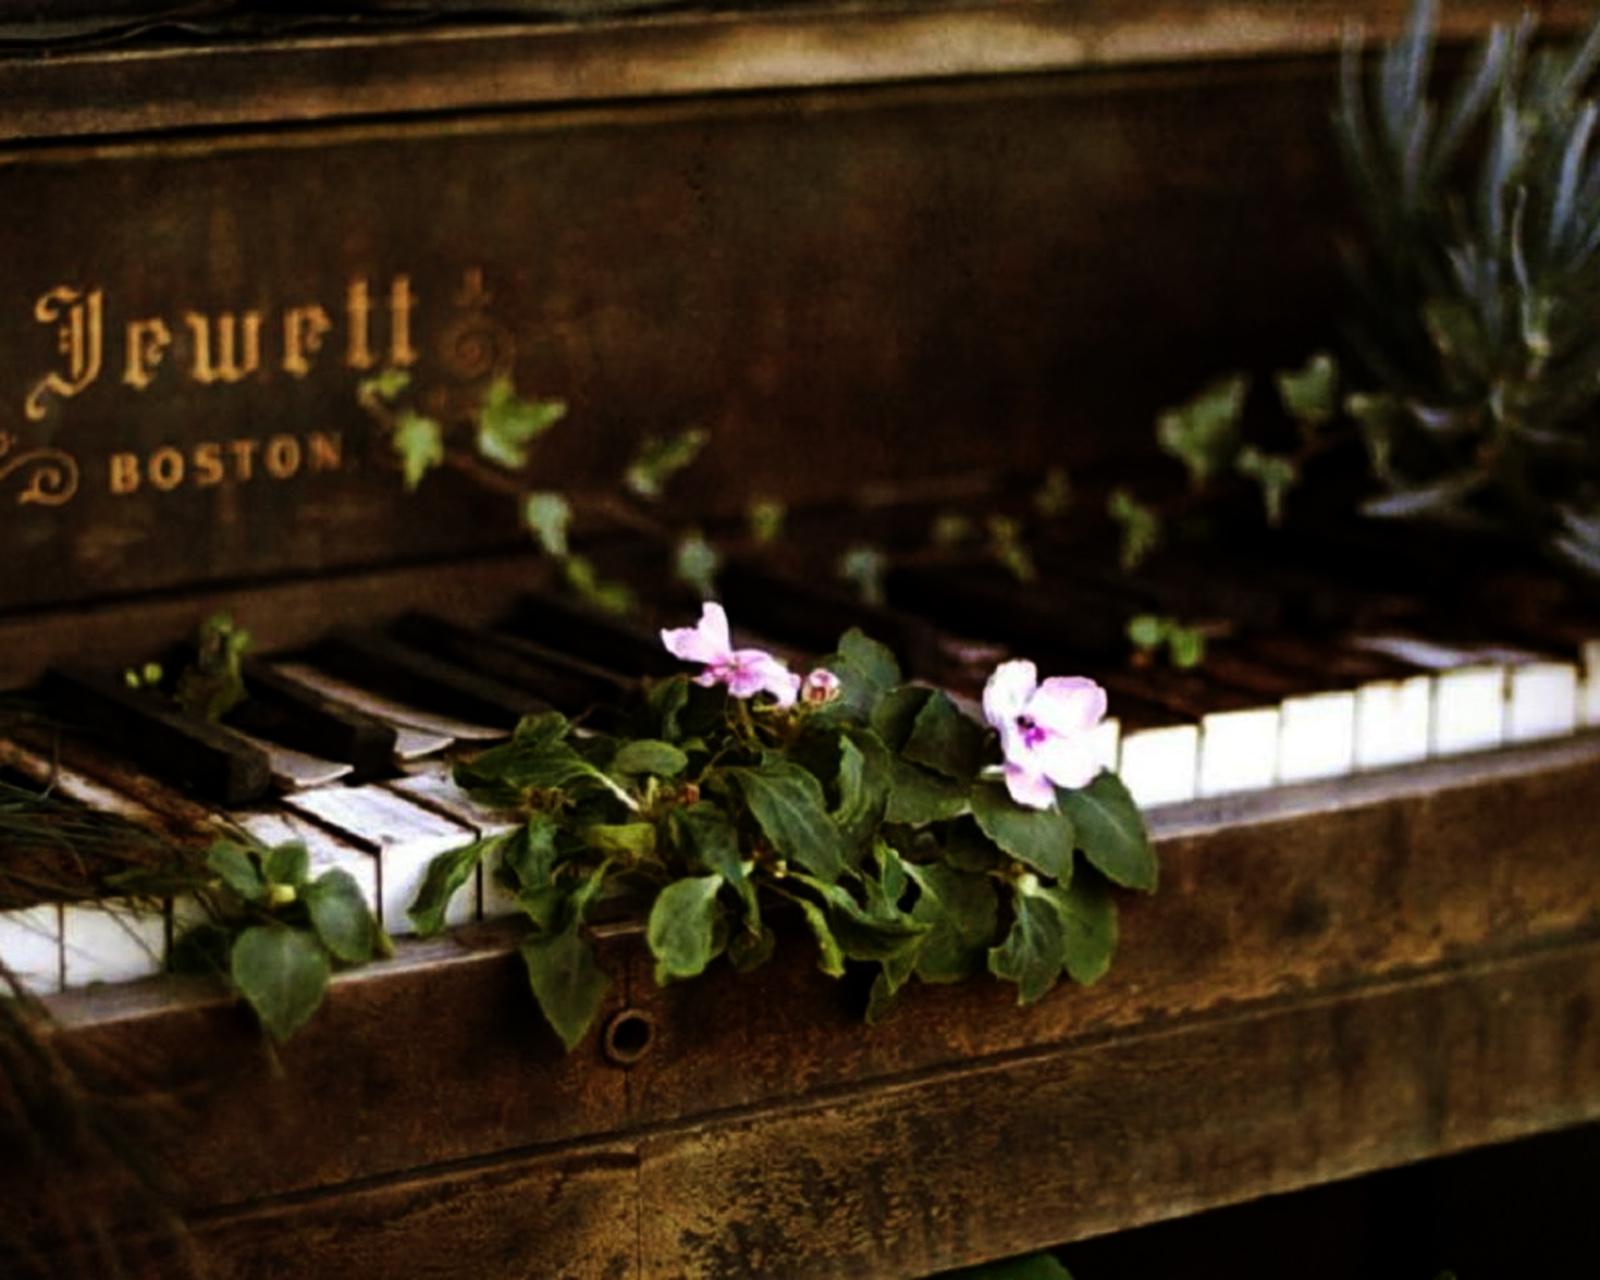 http://4.bp.blogspot.com/-PMtb0tFFrhc/UGhDTTgH1II/AAAAAAAAE8M/F546SwB1FB4/s1600/Jewett-Vintage-Piano-Flowers-on-Keyboard-HD-Wallpaper--Vvallpaper.Net.jpg